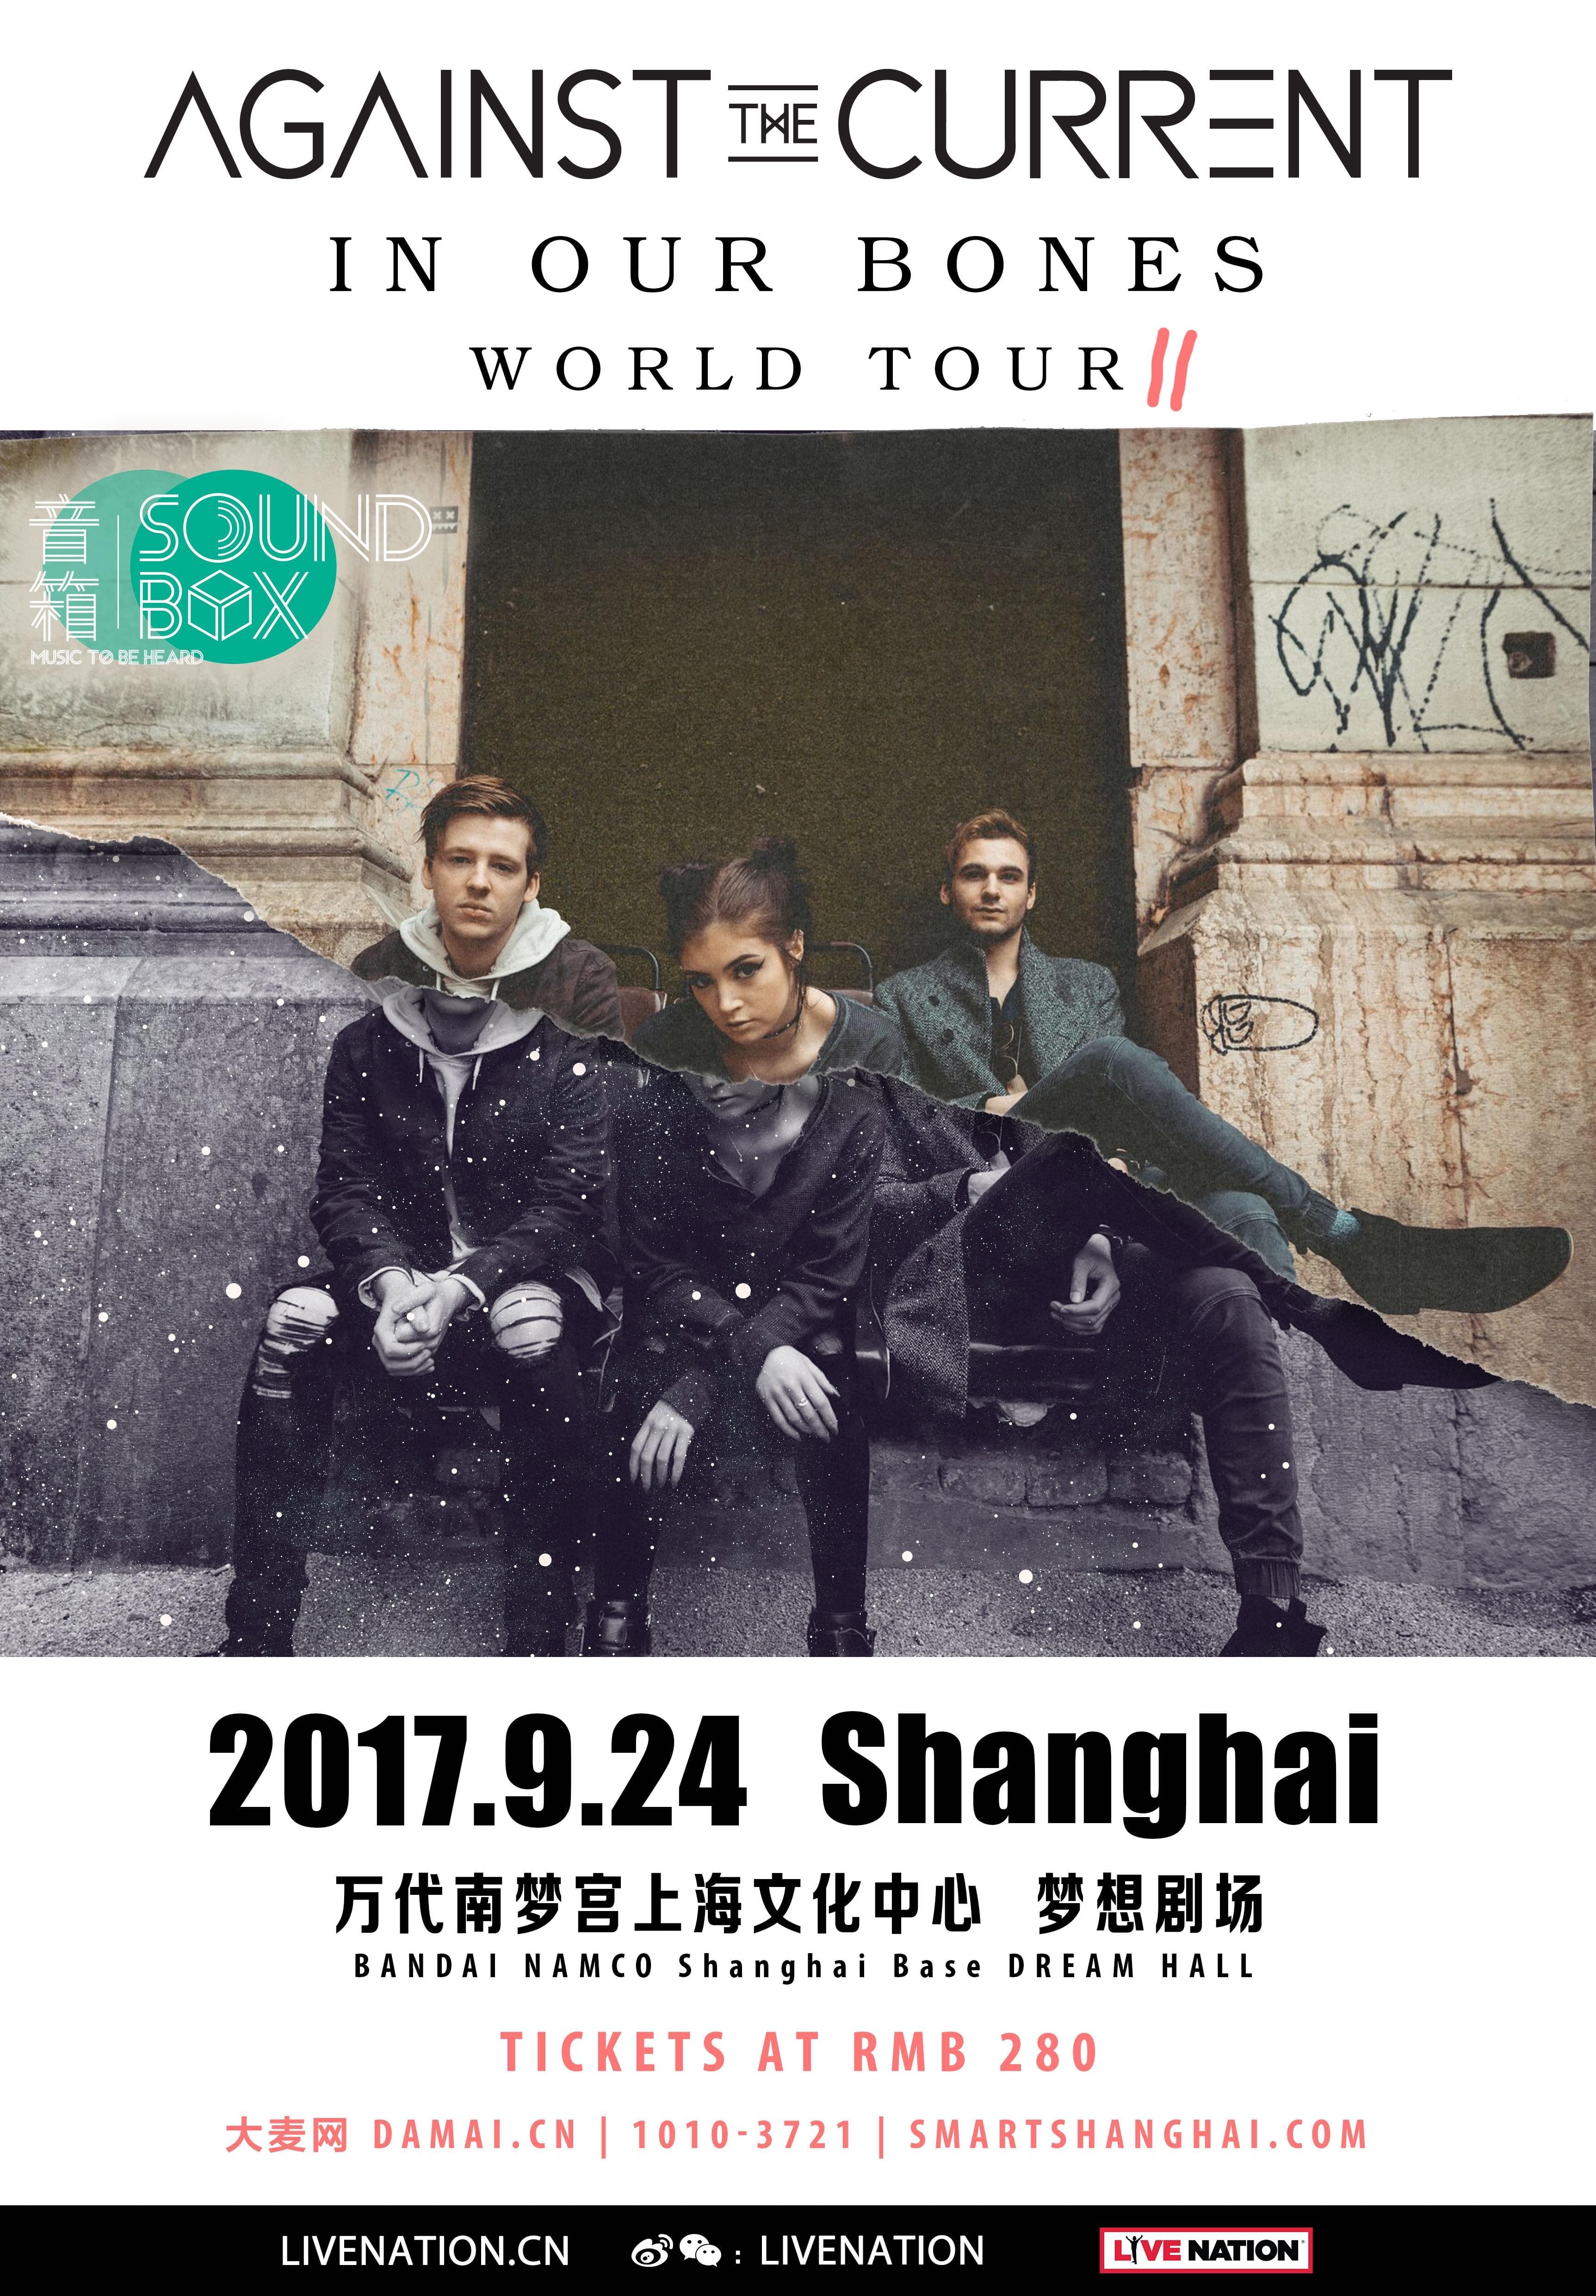 Against The Current 2017 上海演唱会定档9.24